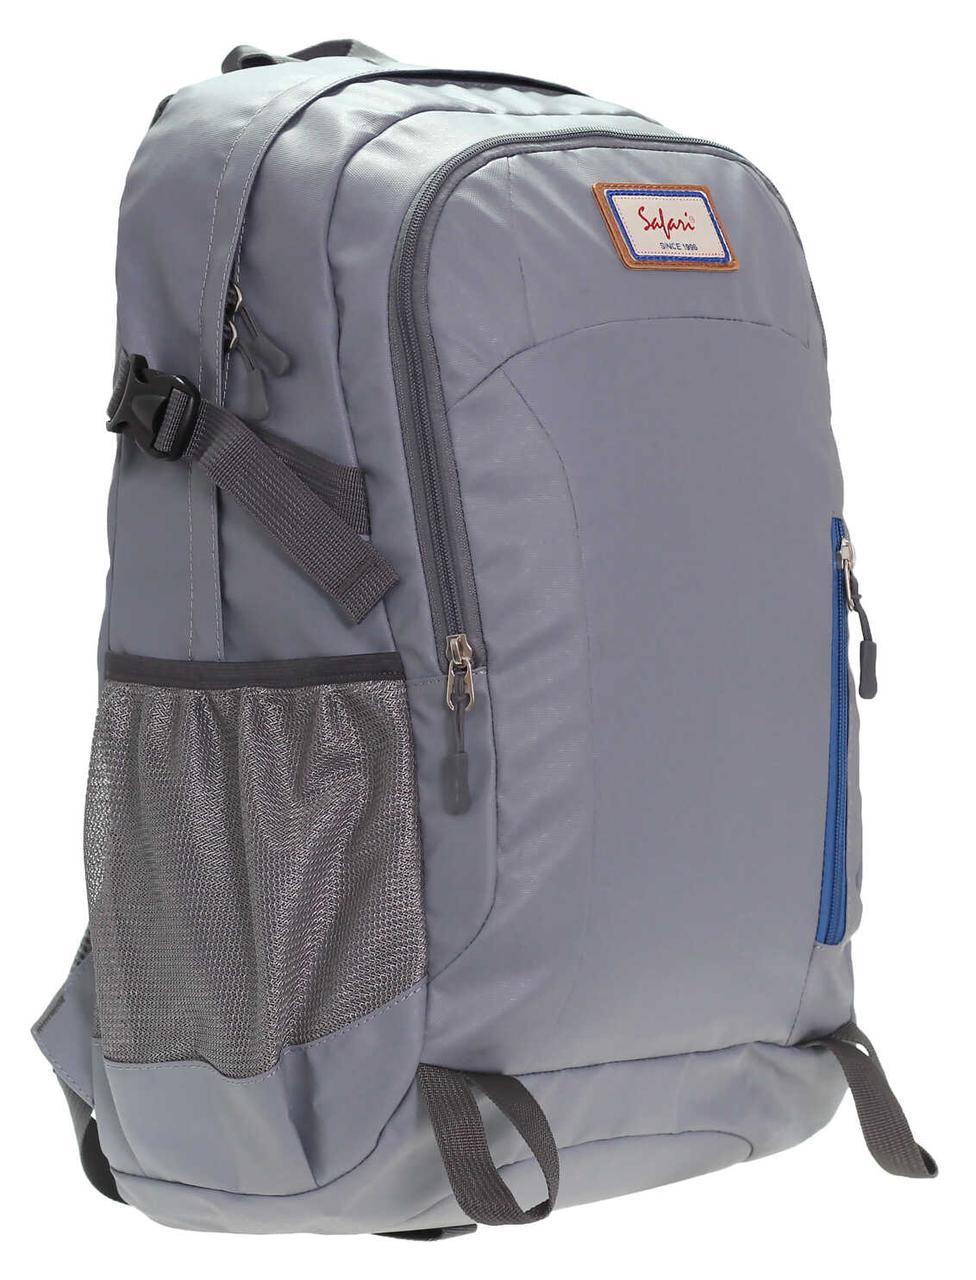 Рюкзак, 2 отд., 49*30*19см, полиестер, 19-135L-1, SAF